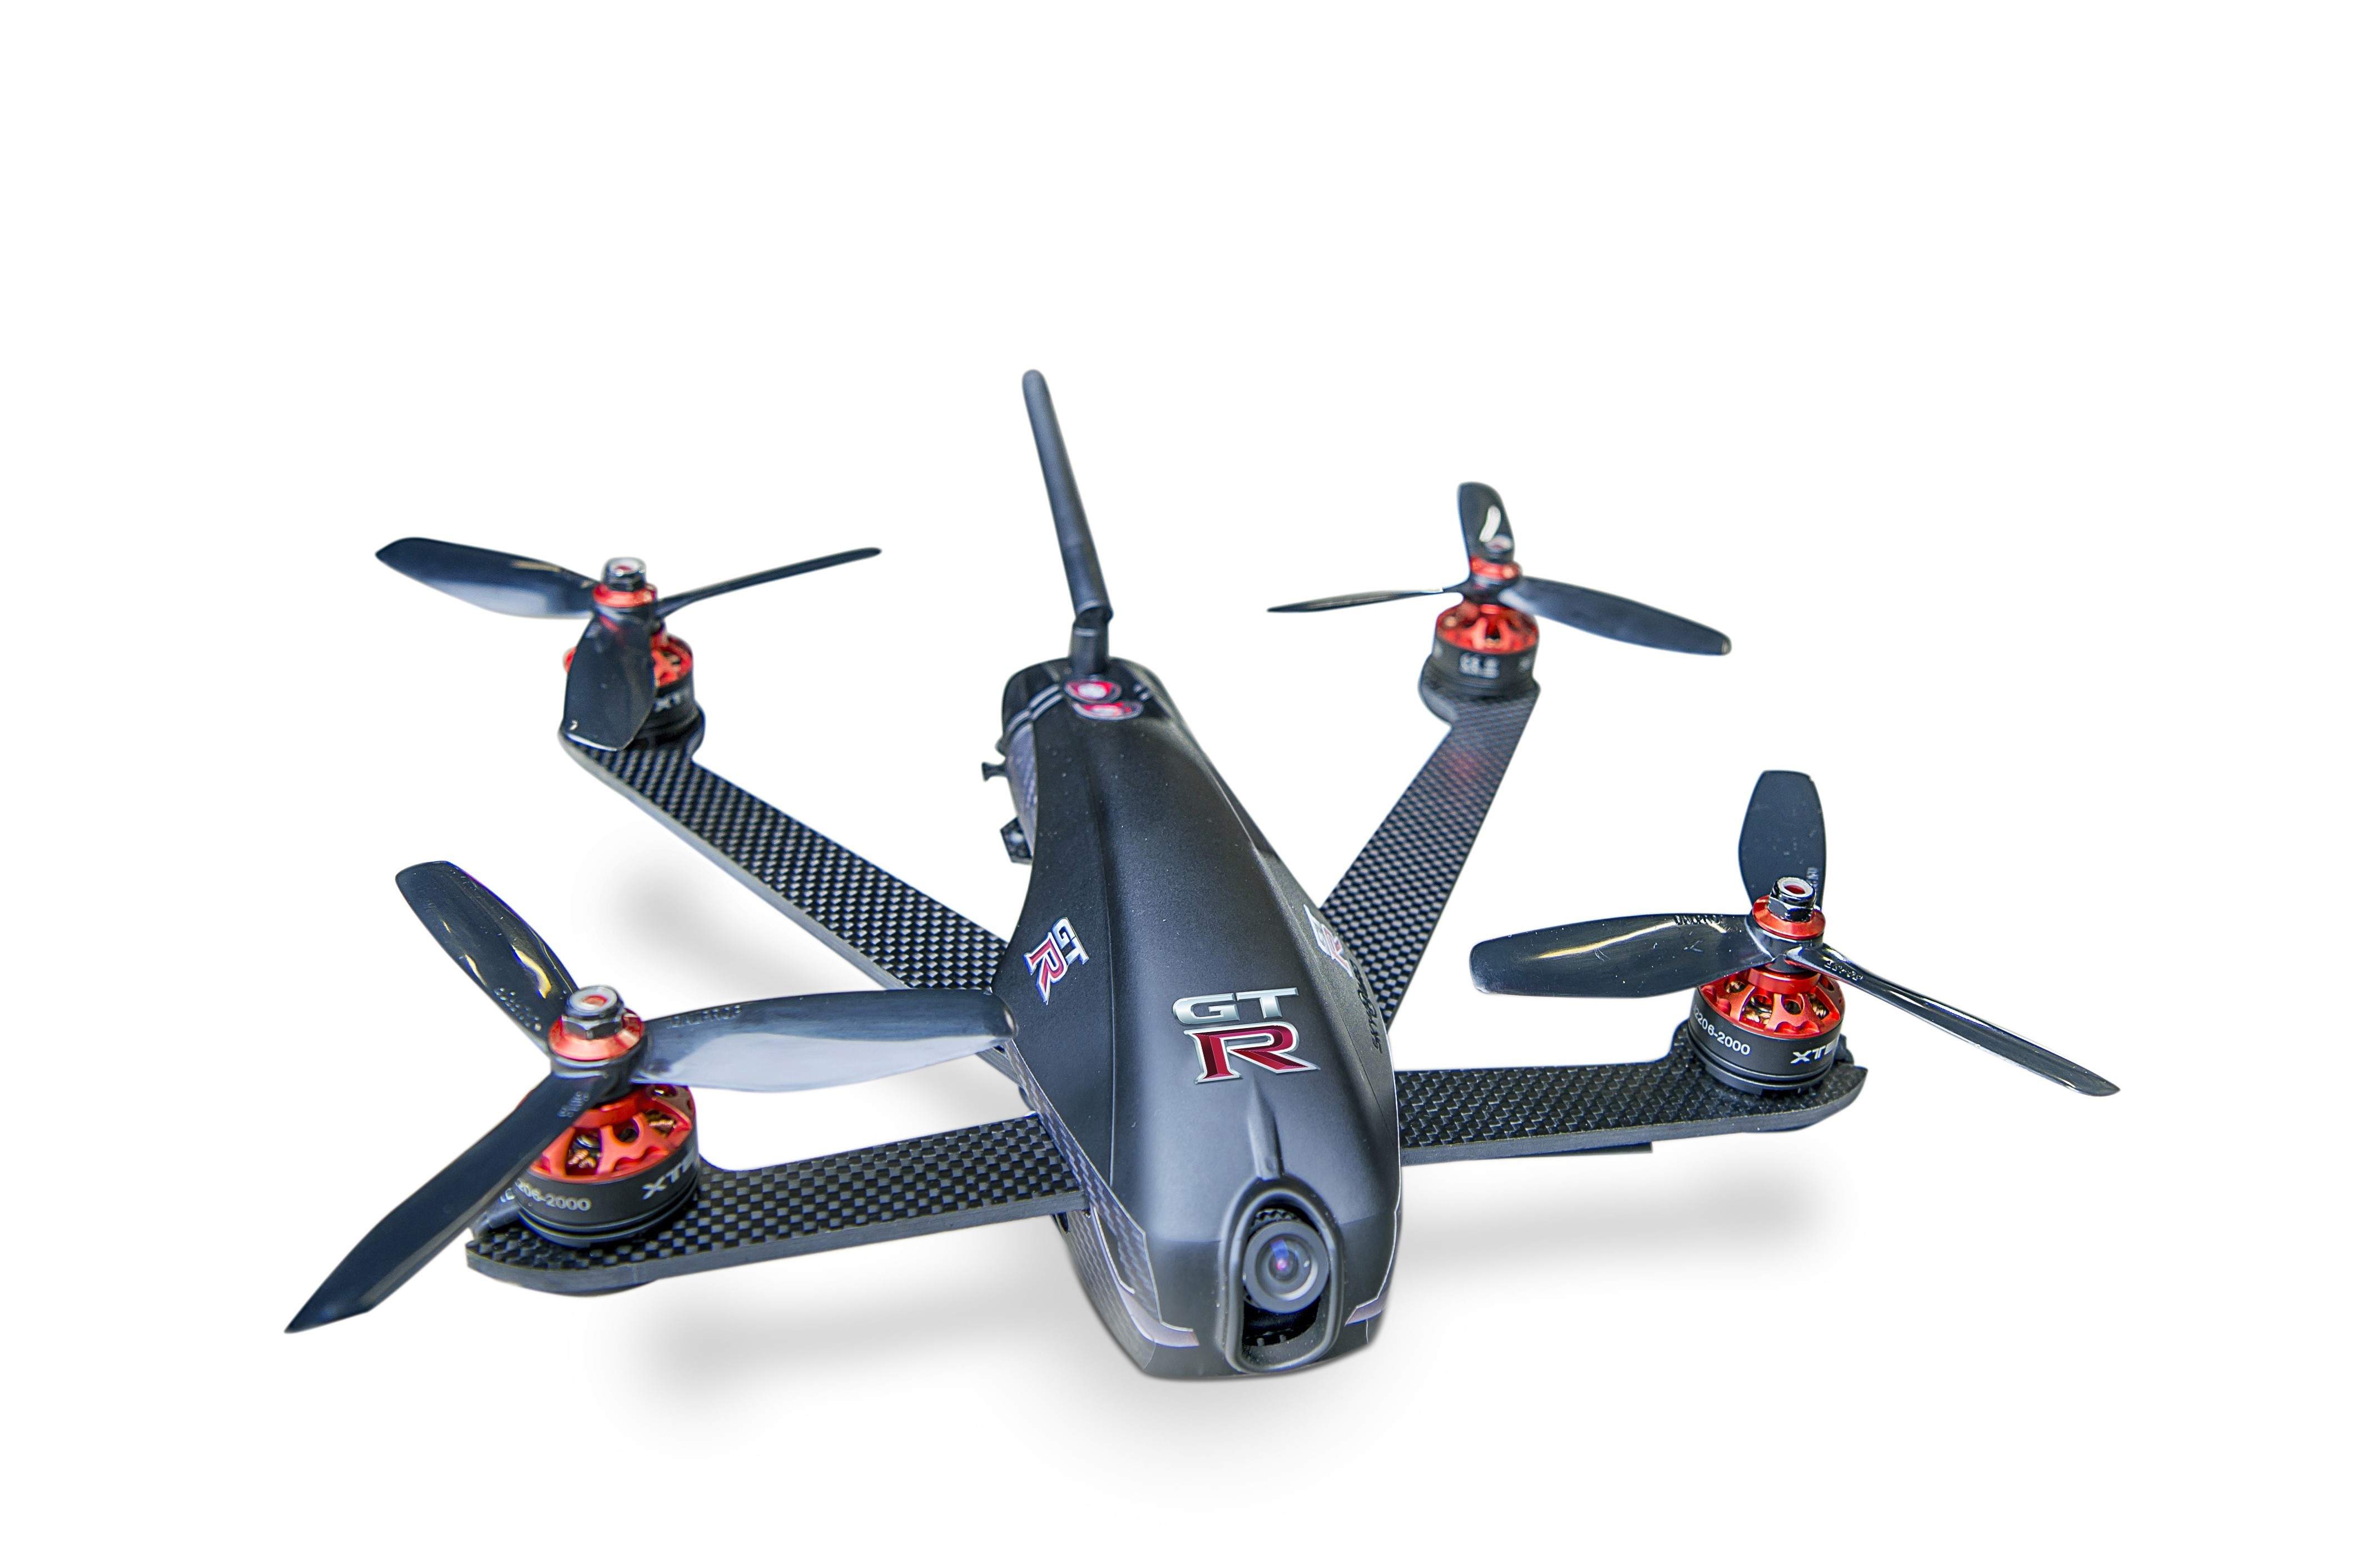 nissan gtr drone (2)